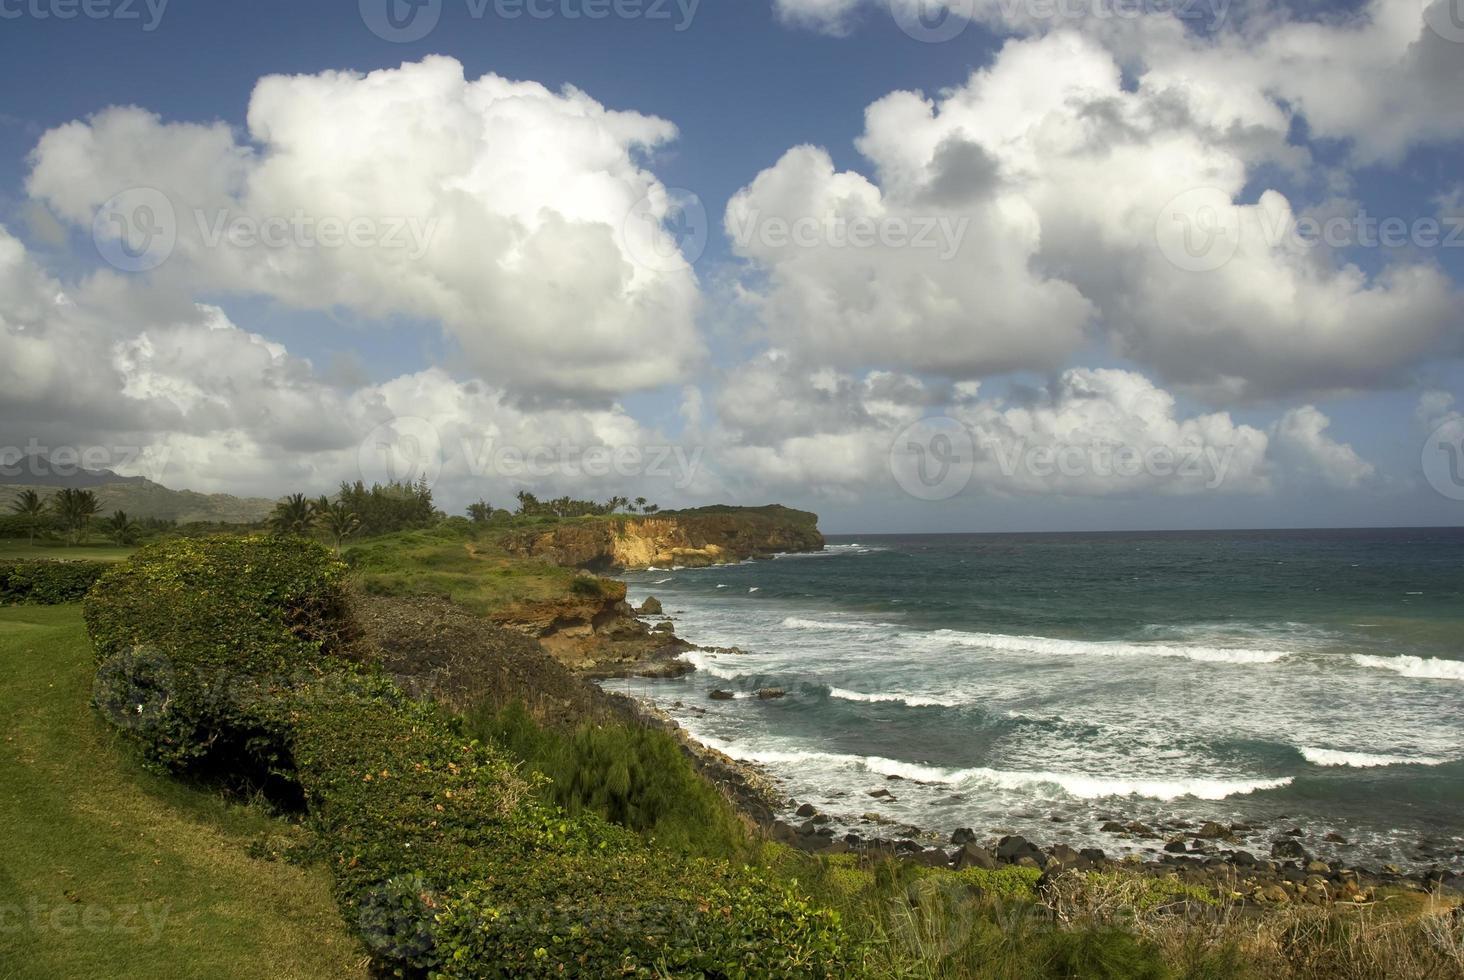 Kawai, Hawaii, costa con cielo blu e nuvole bianche foto